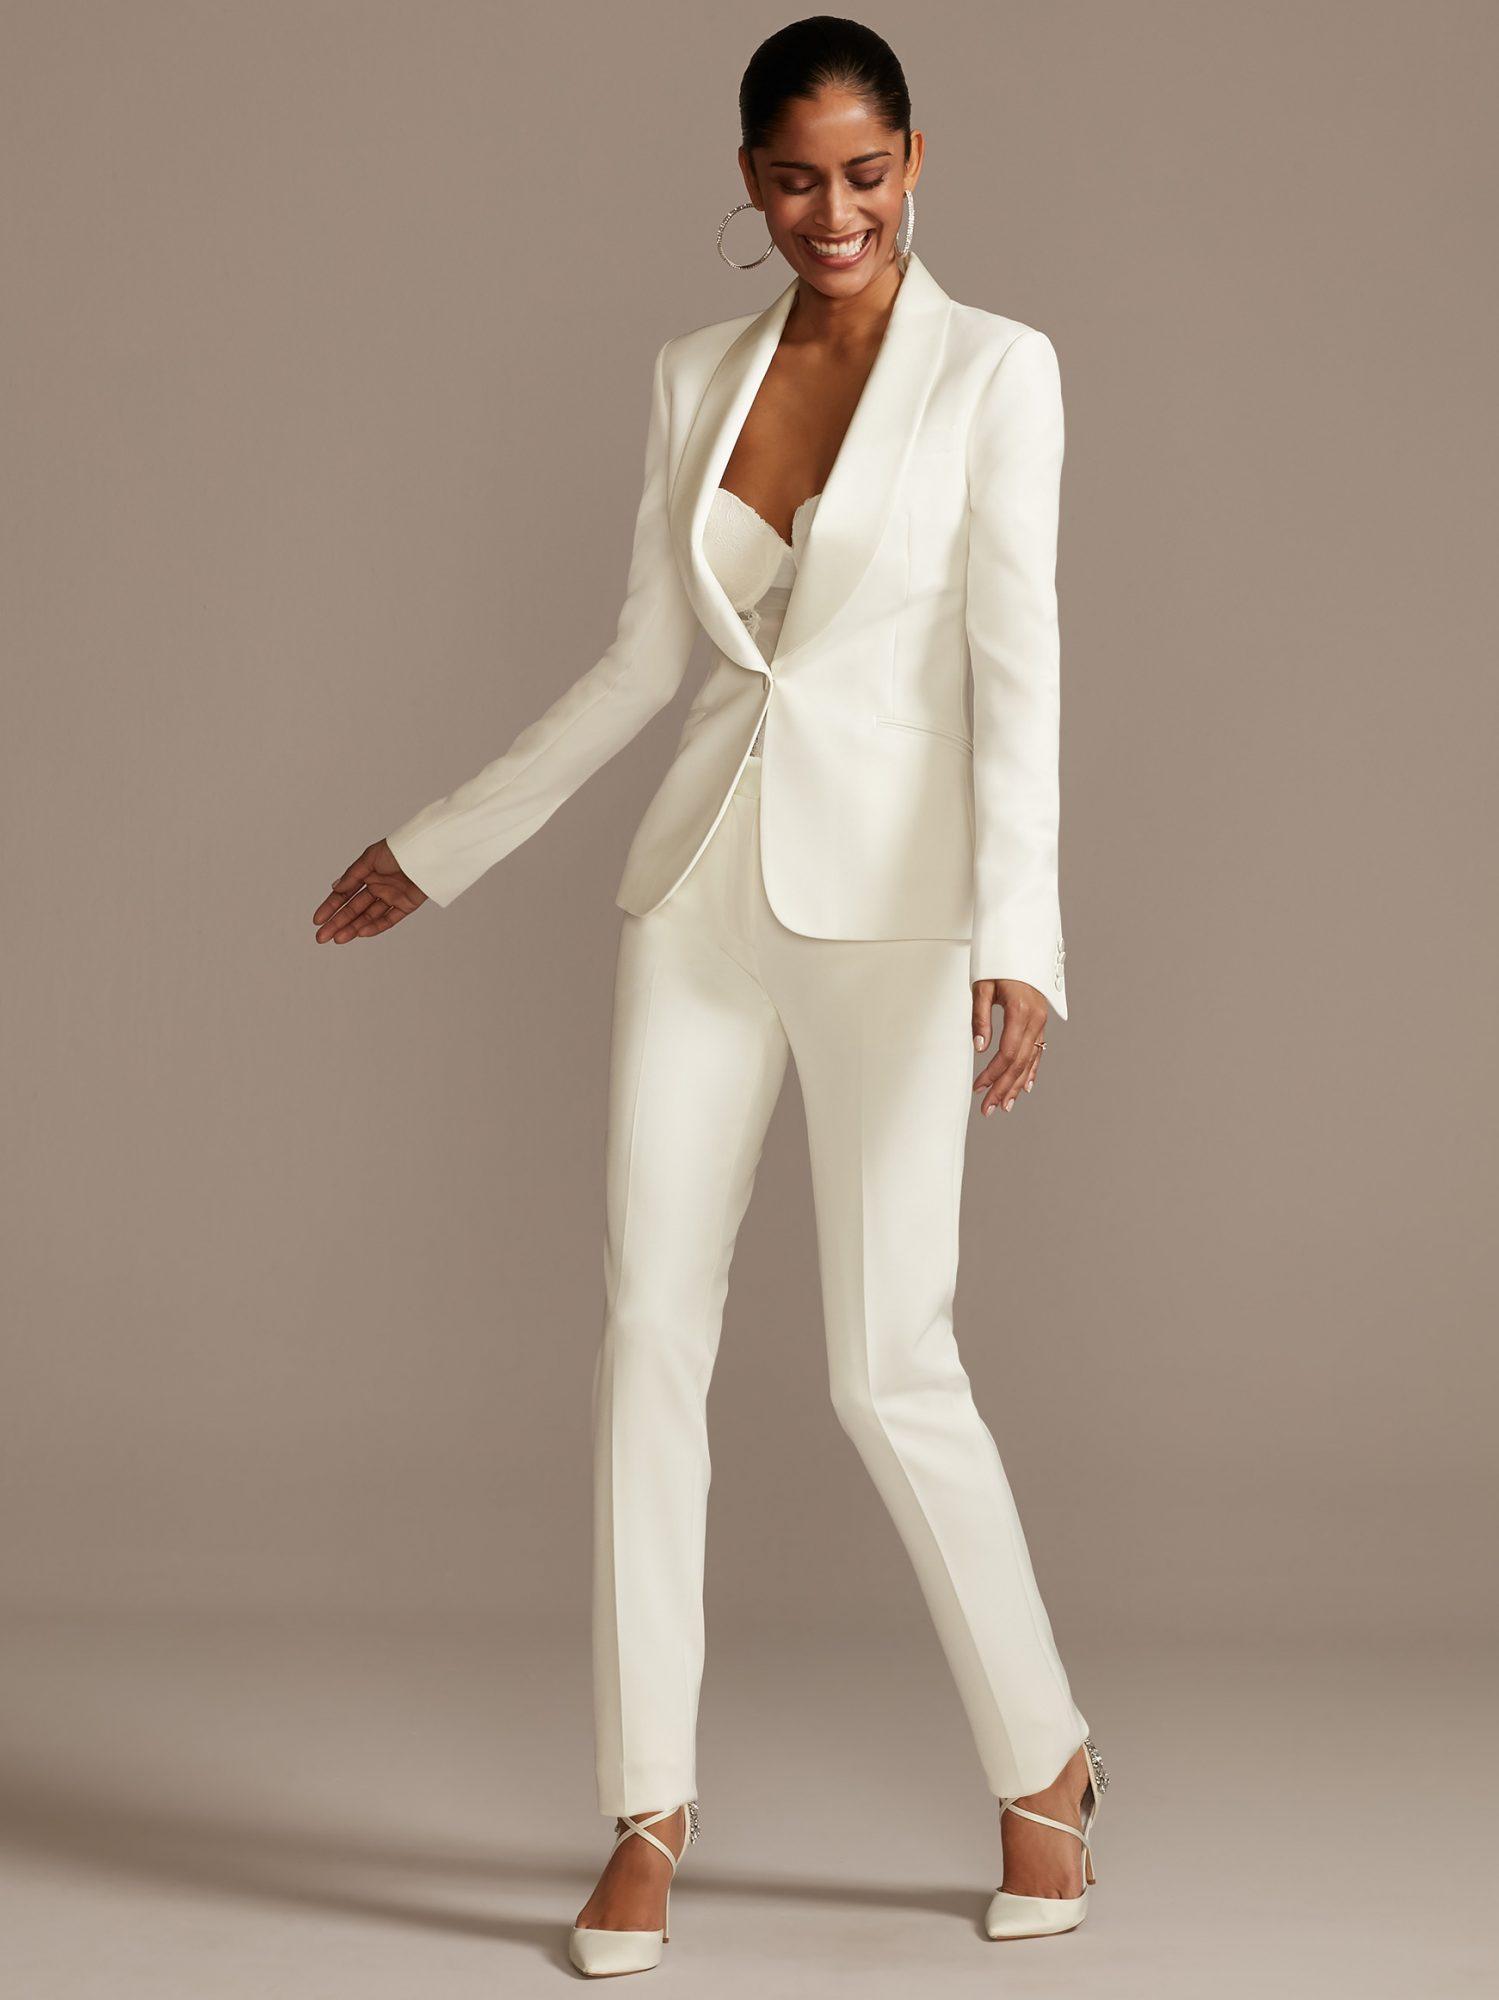 davids bridal pant suit wedding dress spring 2021